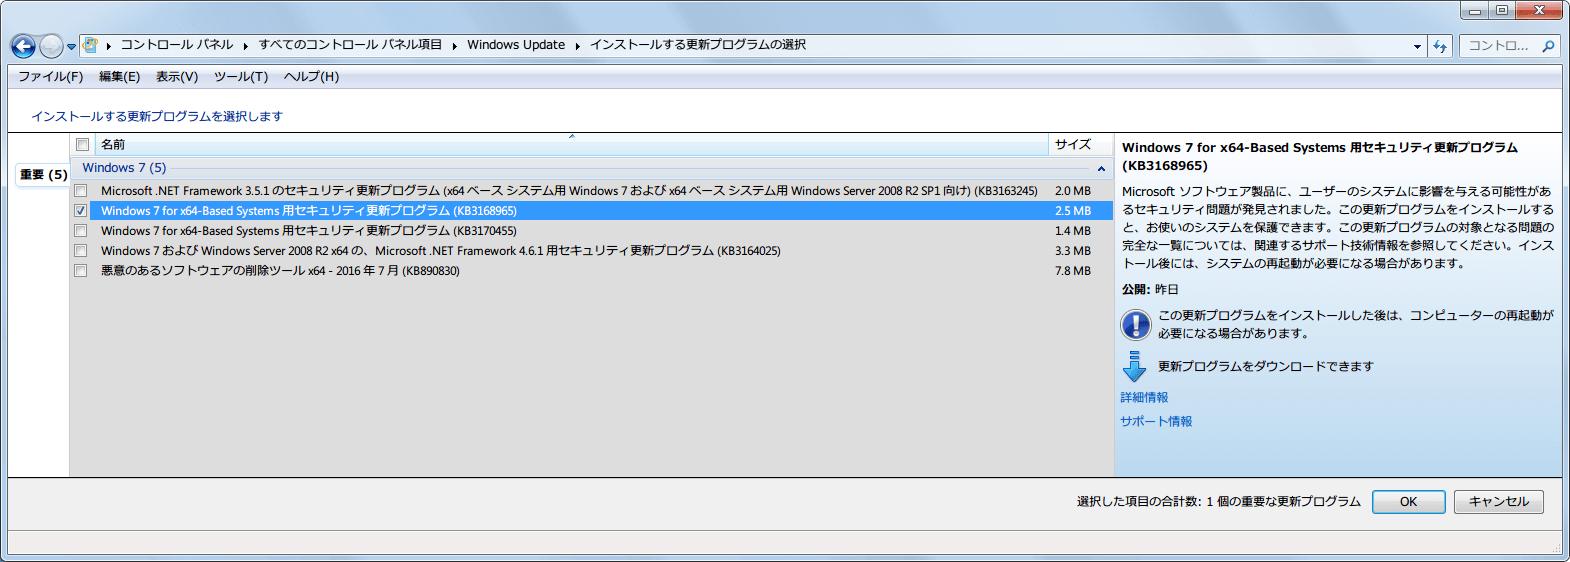 Windows 7 for x64-Based Systems 用セキュリティ更新プログラム KB3168965 公開:2016/07/13 Windows Update チェック時間短縮のため先にインストール